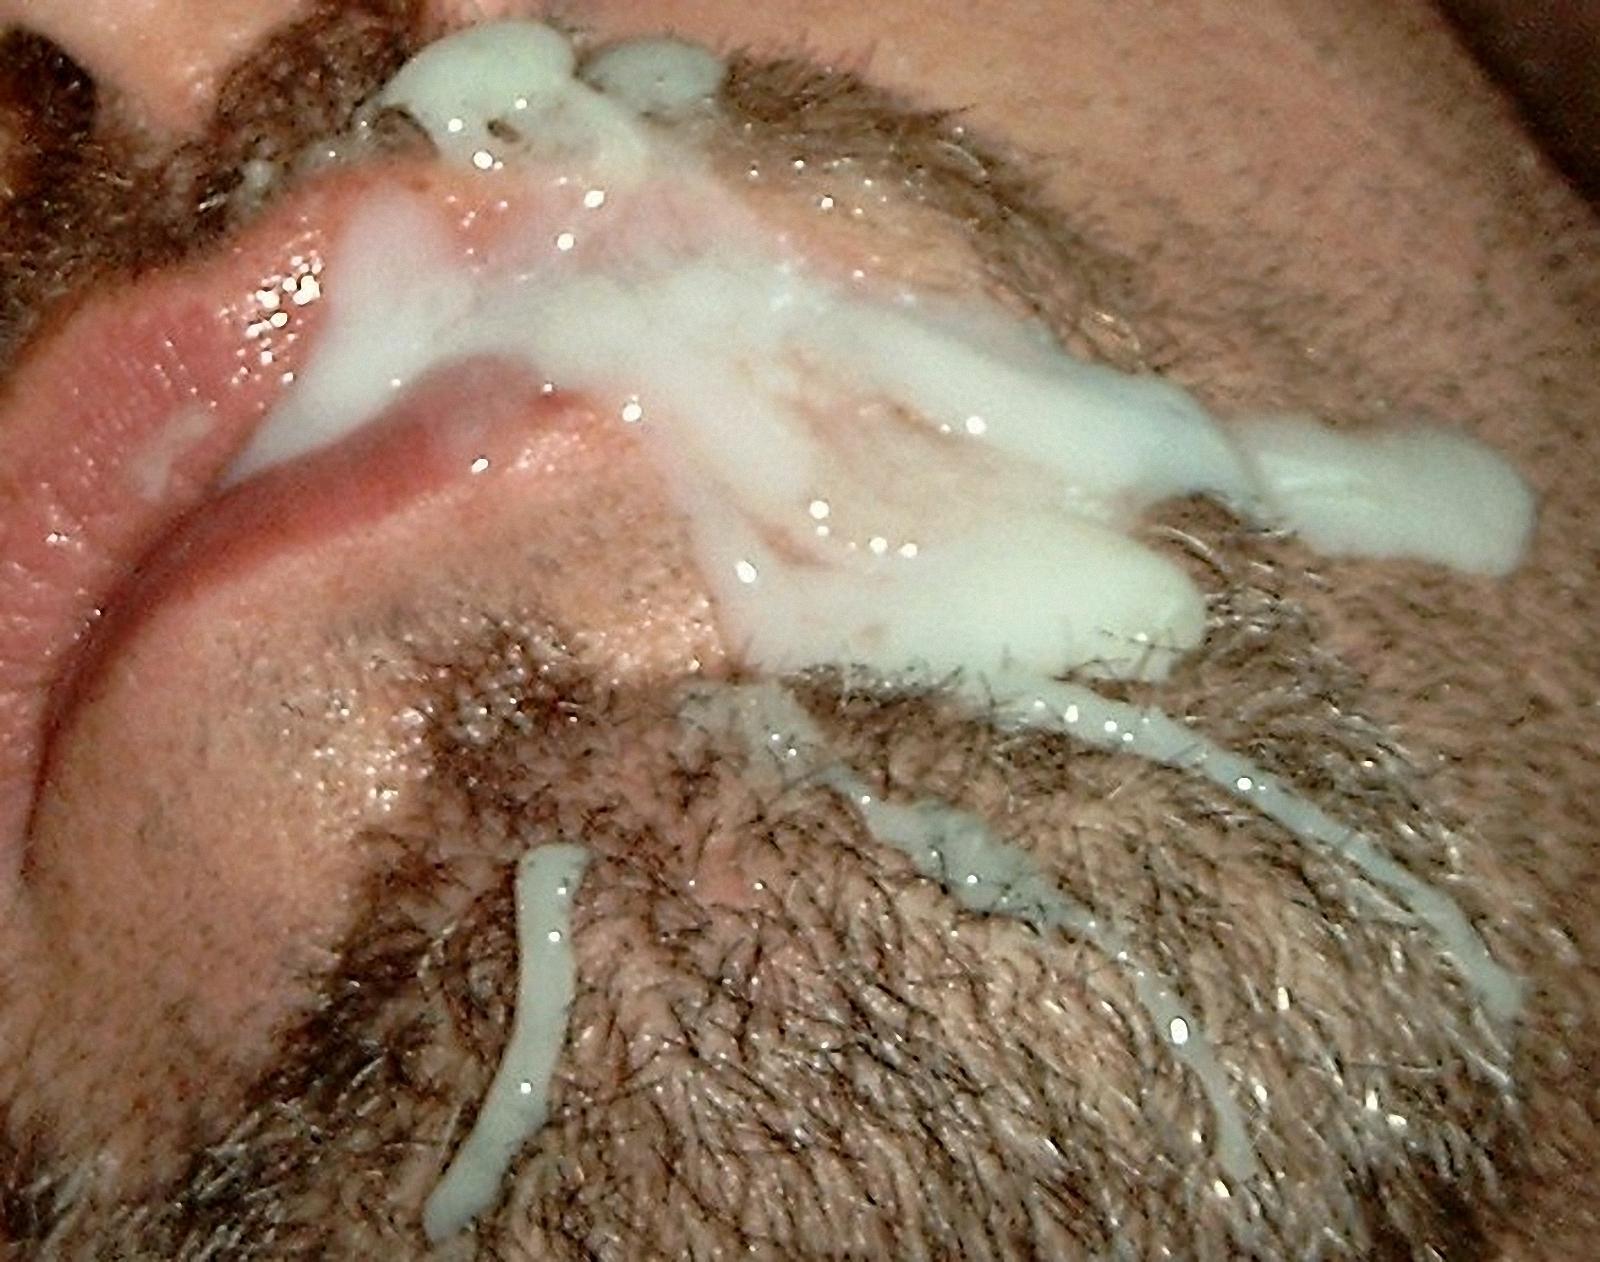 Сперма на лице мужика фото 3 фотография